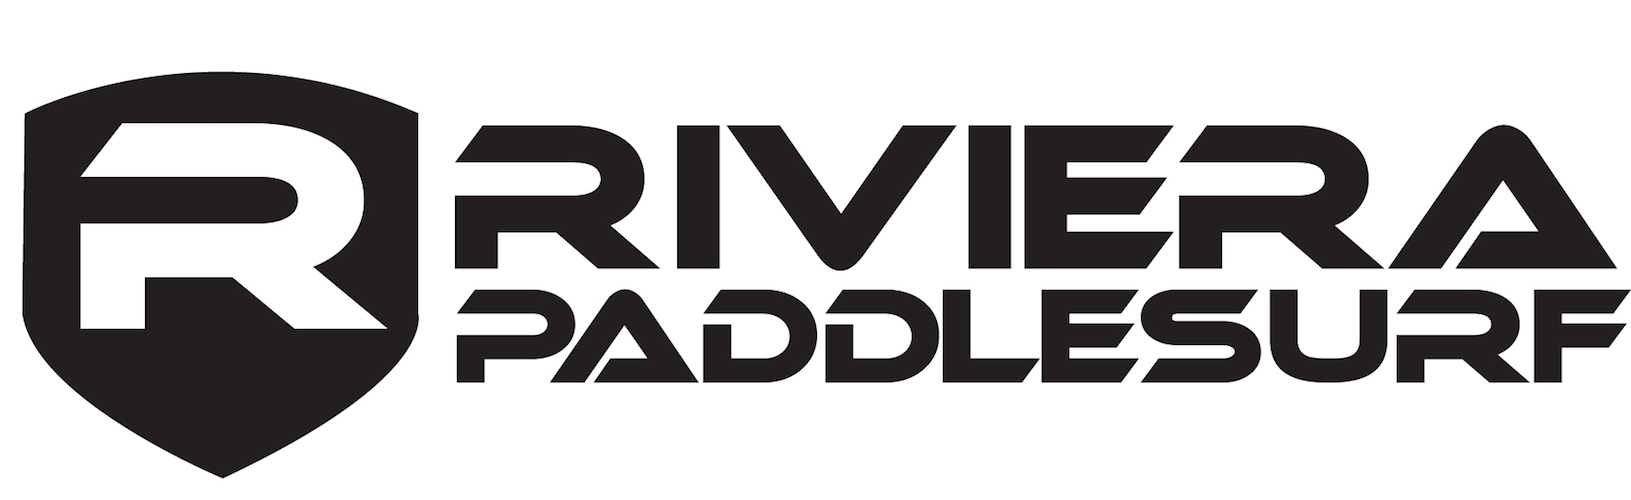 Riviera-Paddle-Surfing.jpg